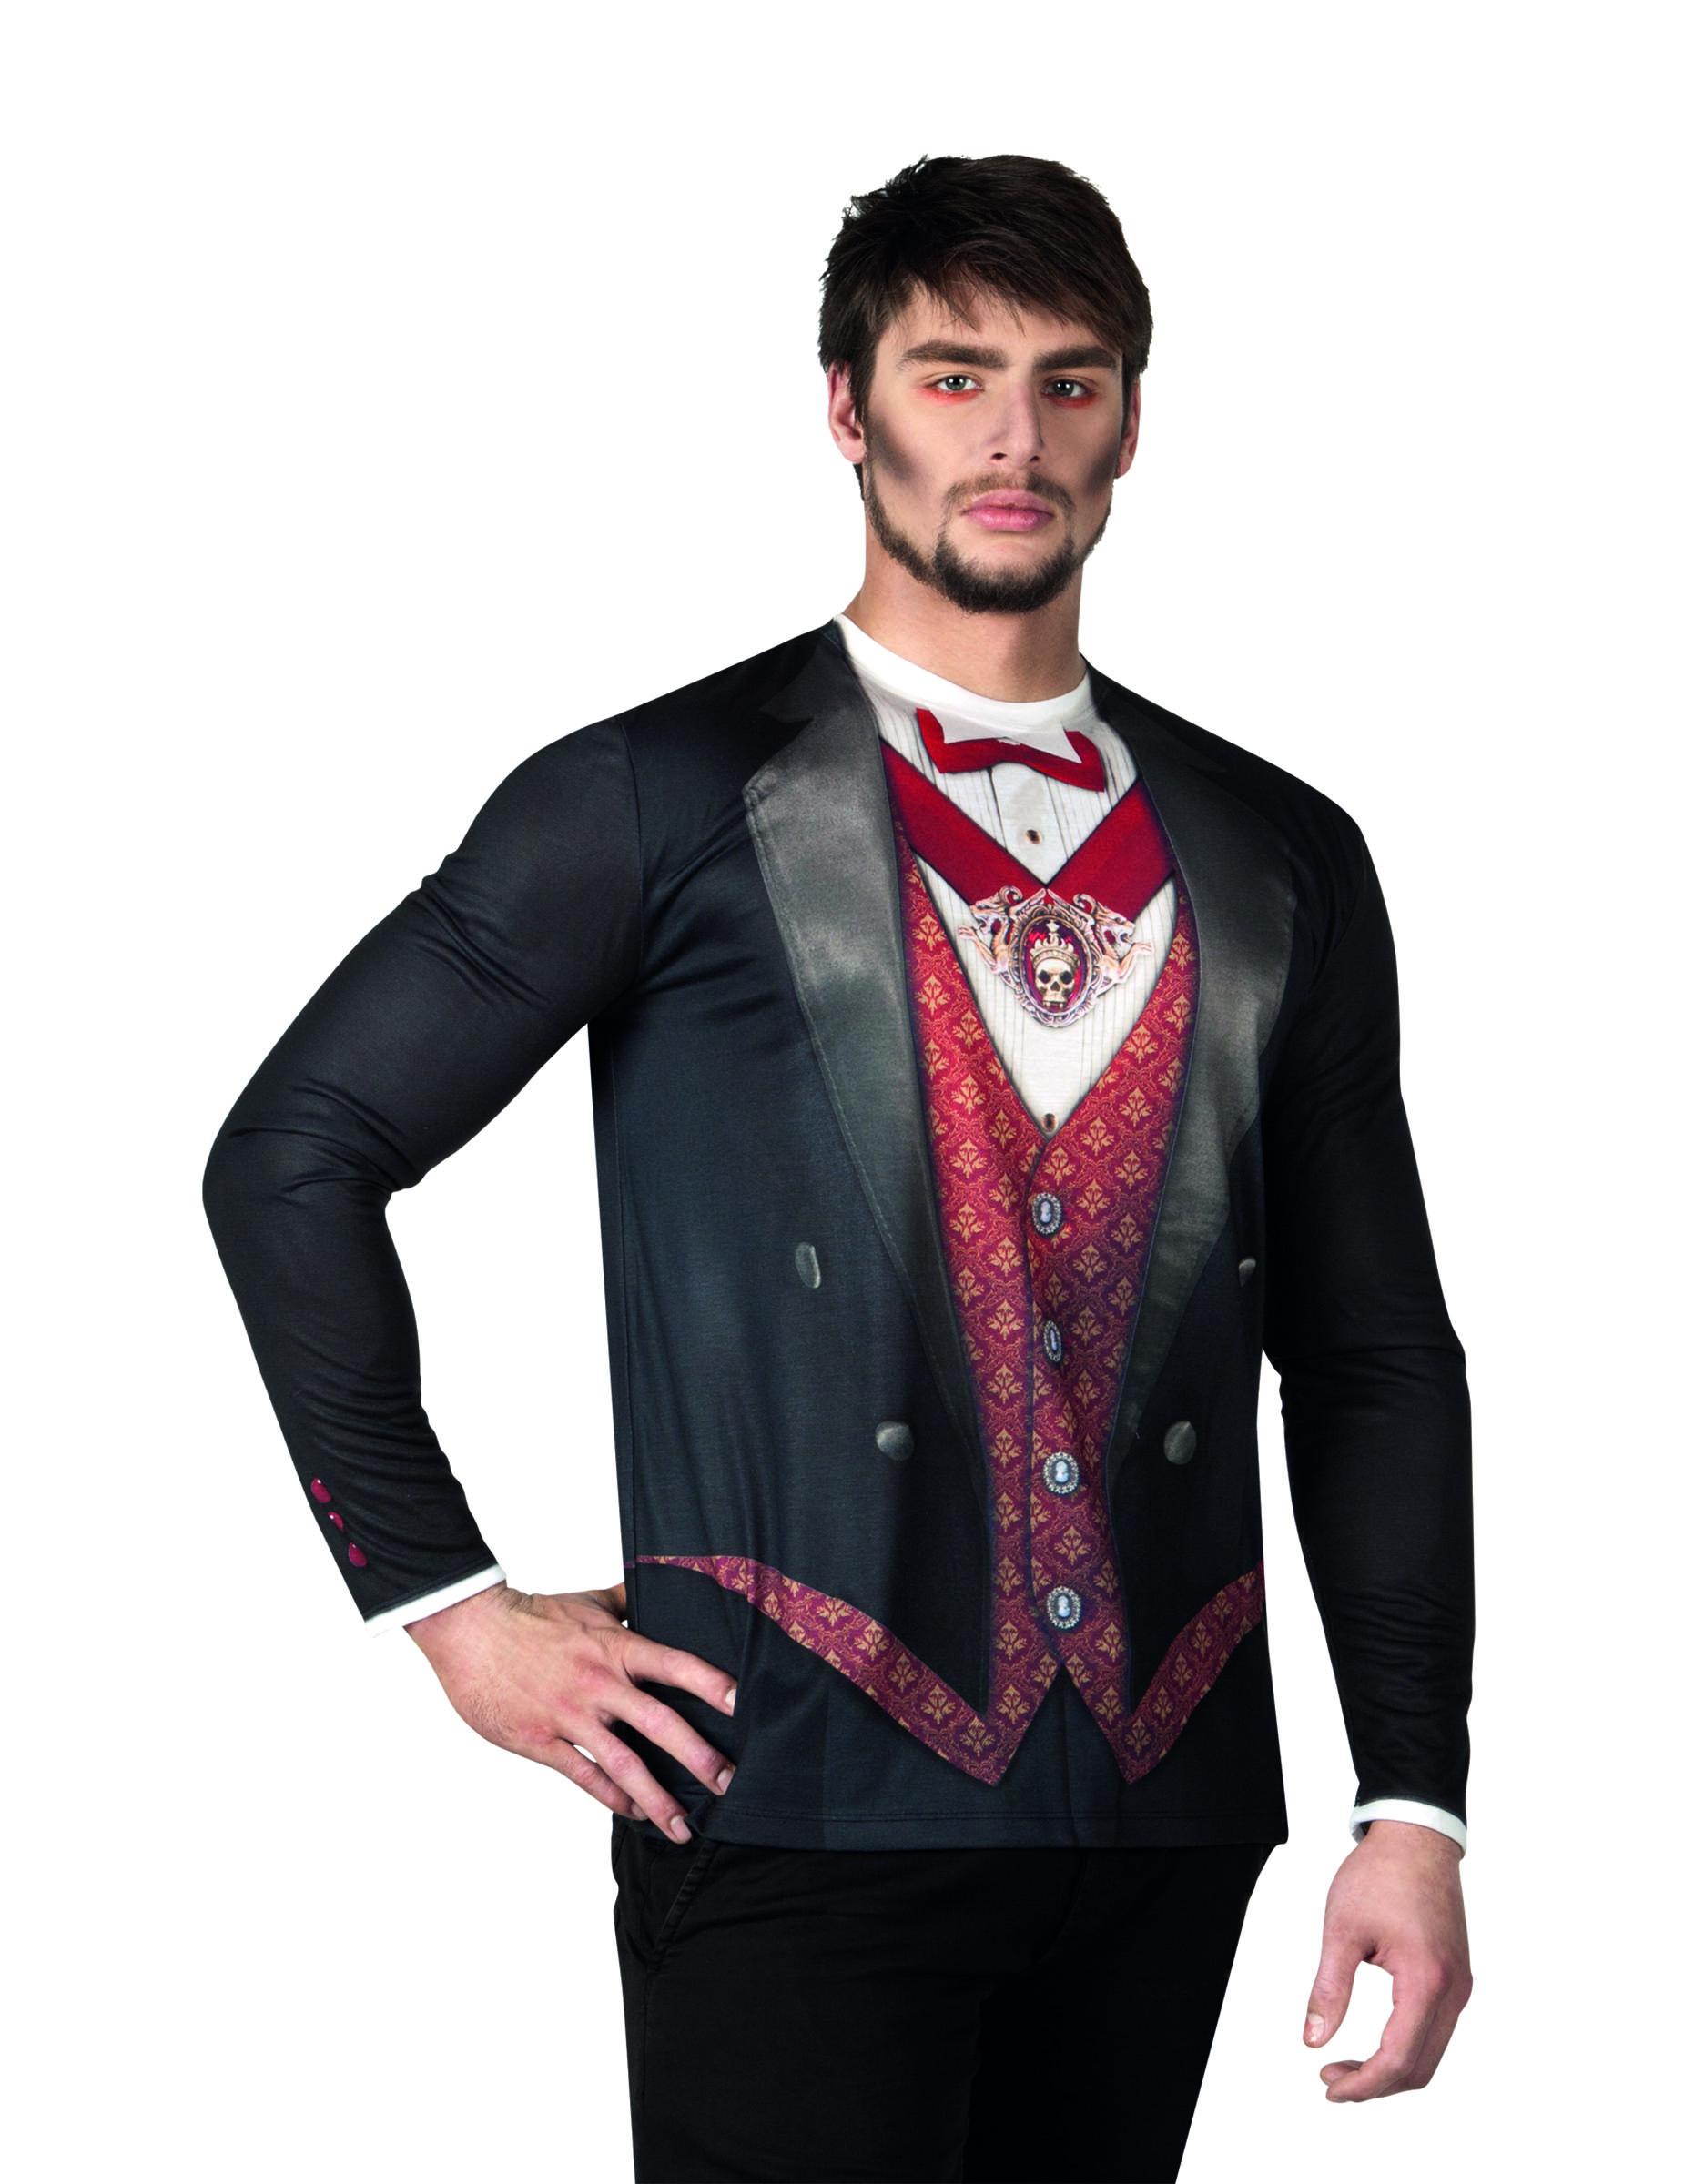 Camiseta de vampiro hombre Halloween Disfraces adultosy disfraces